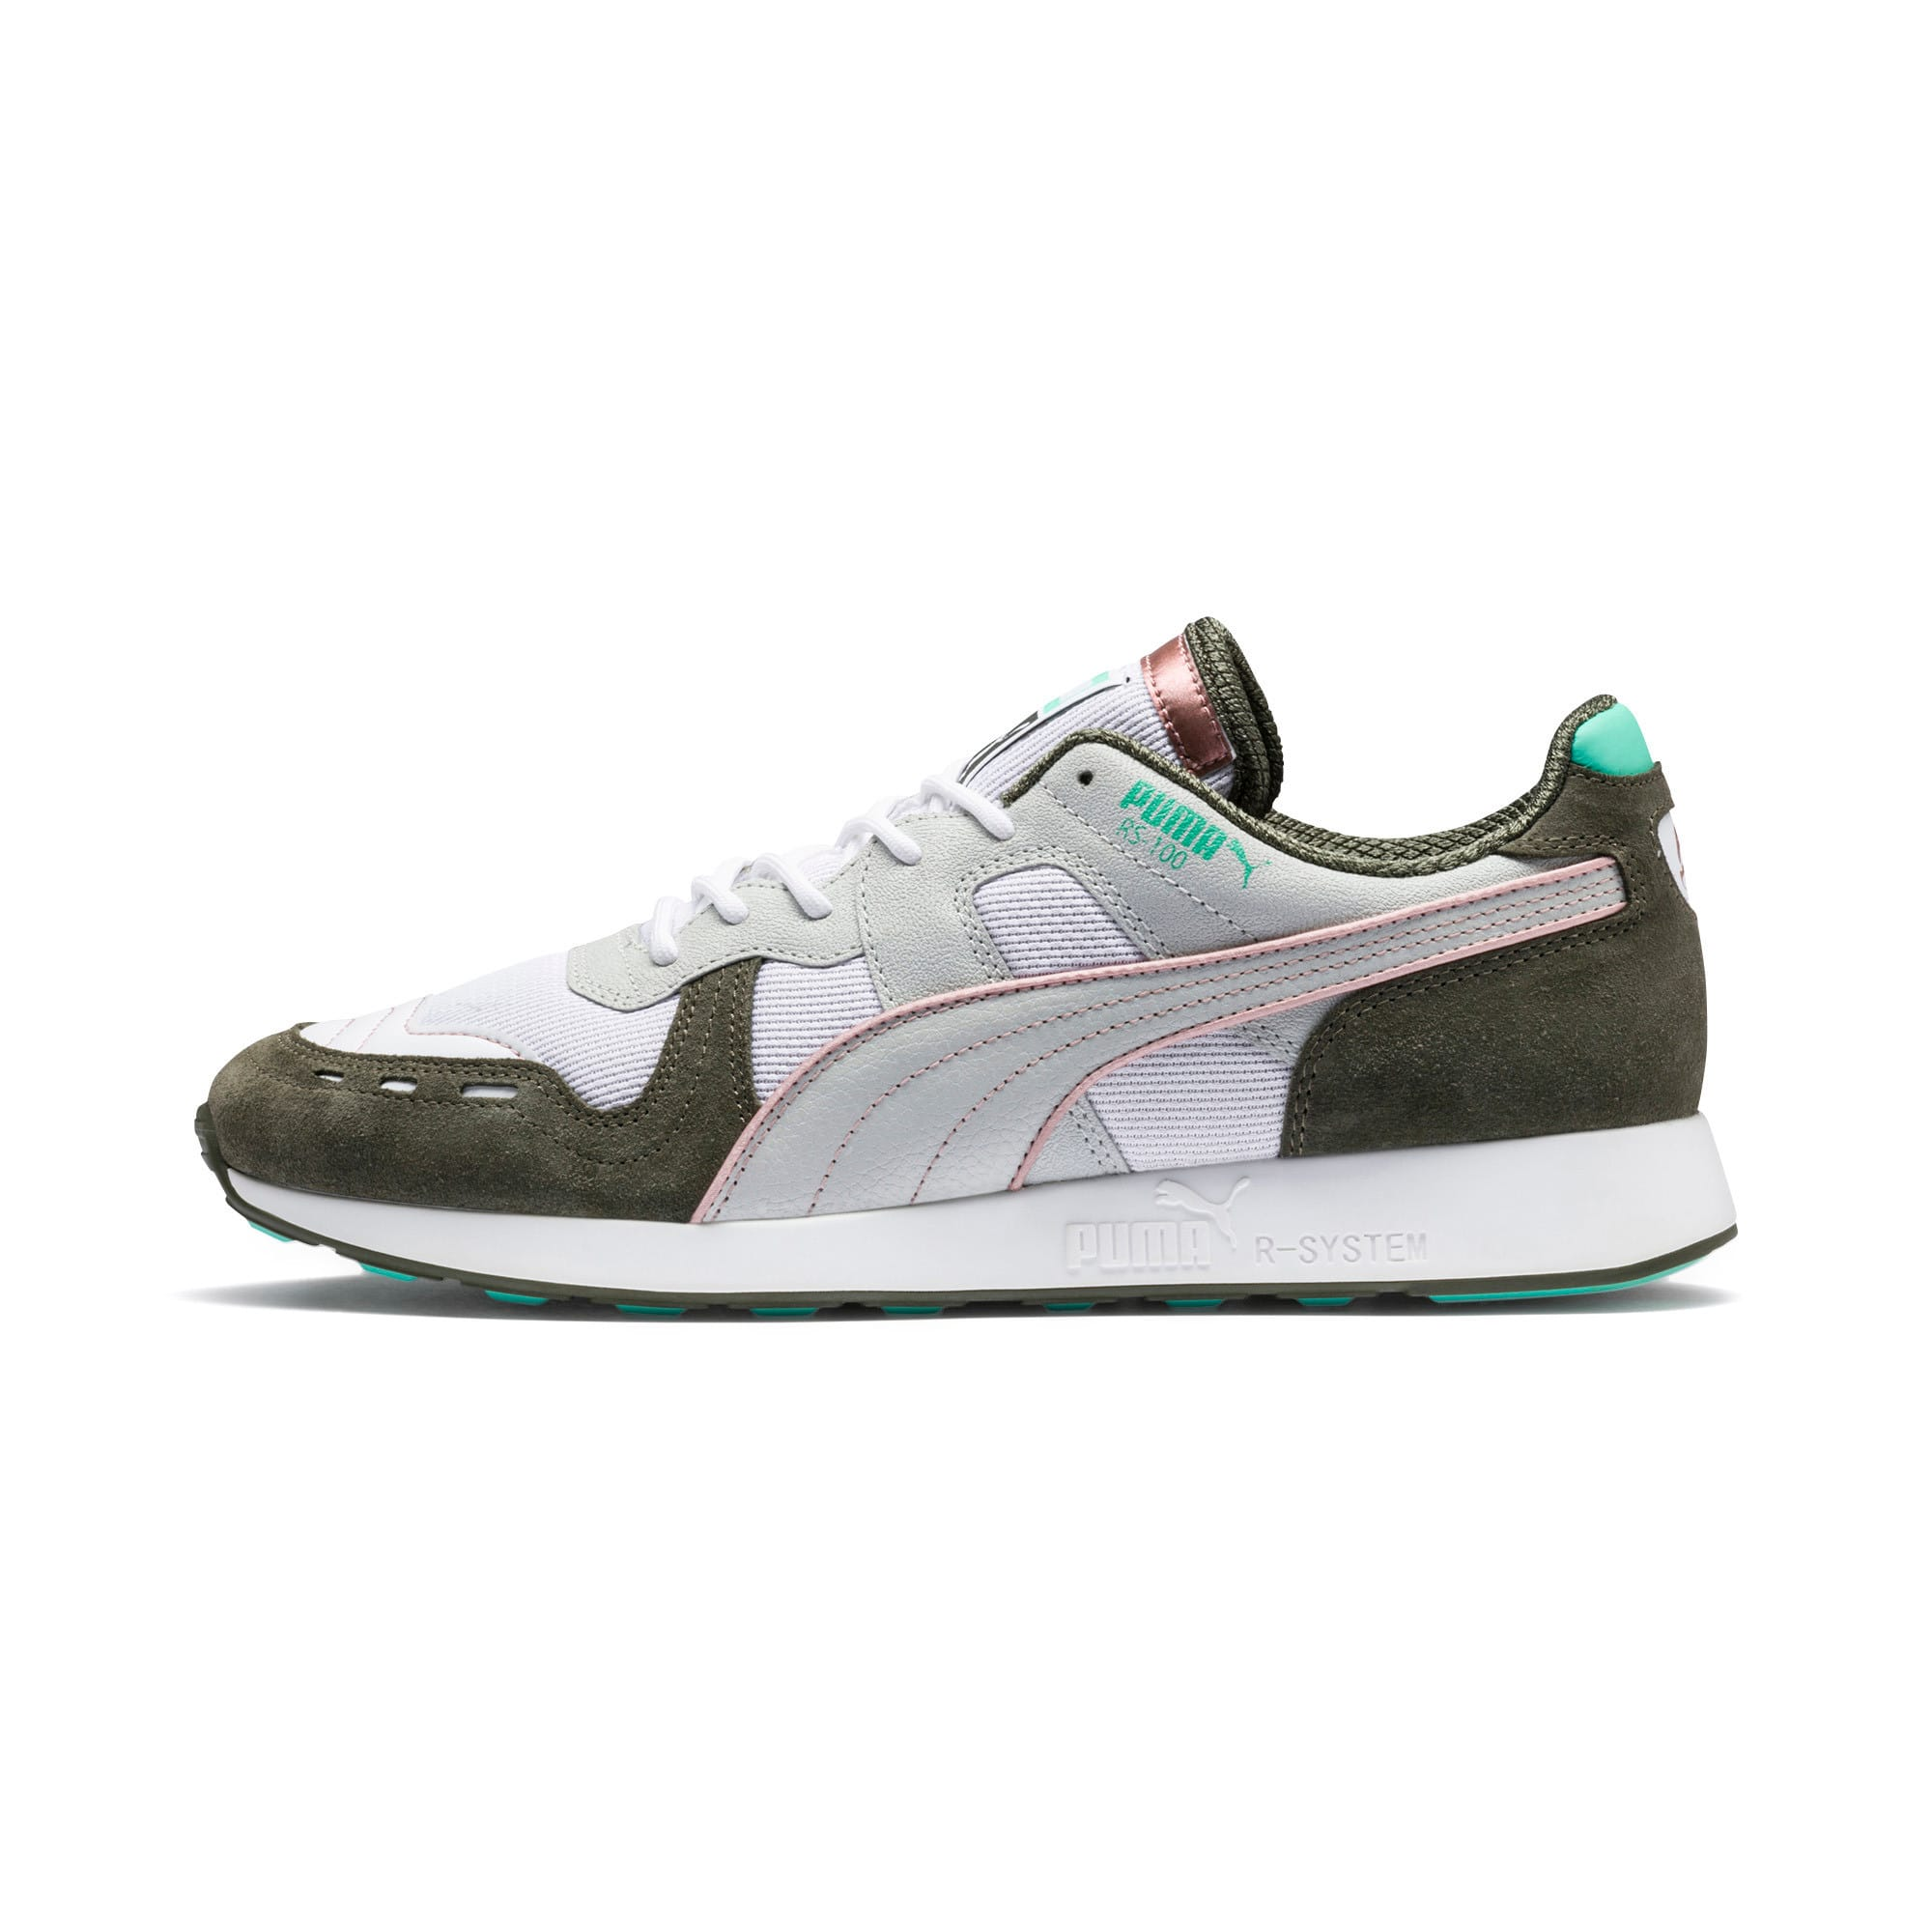 cheaper e929d 8f529 PUMA x Emory Jones RS-100 Sneakers